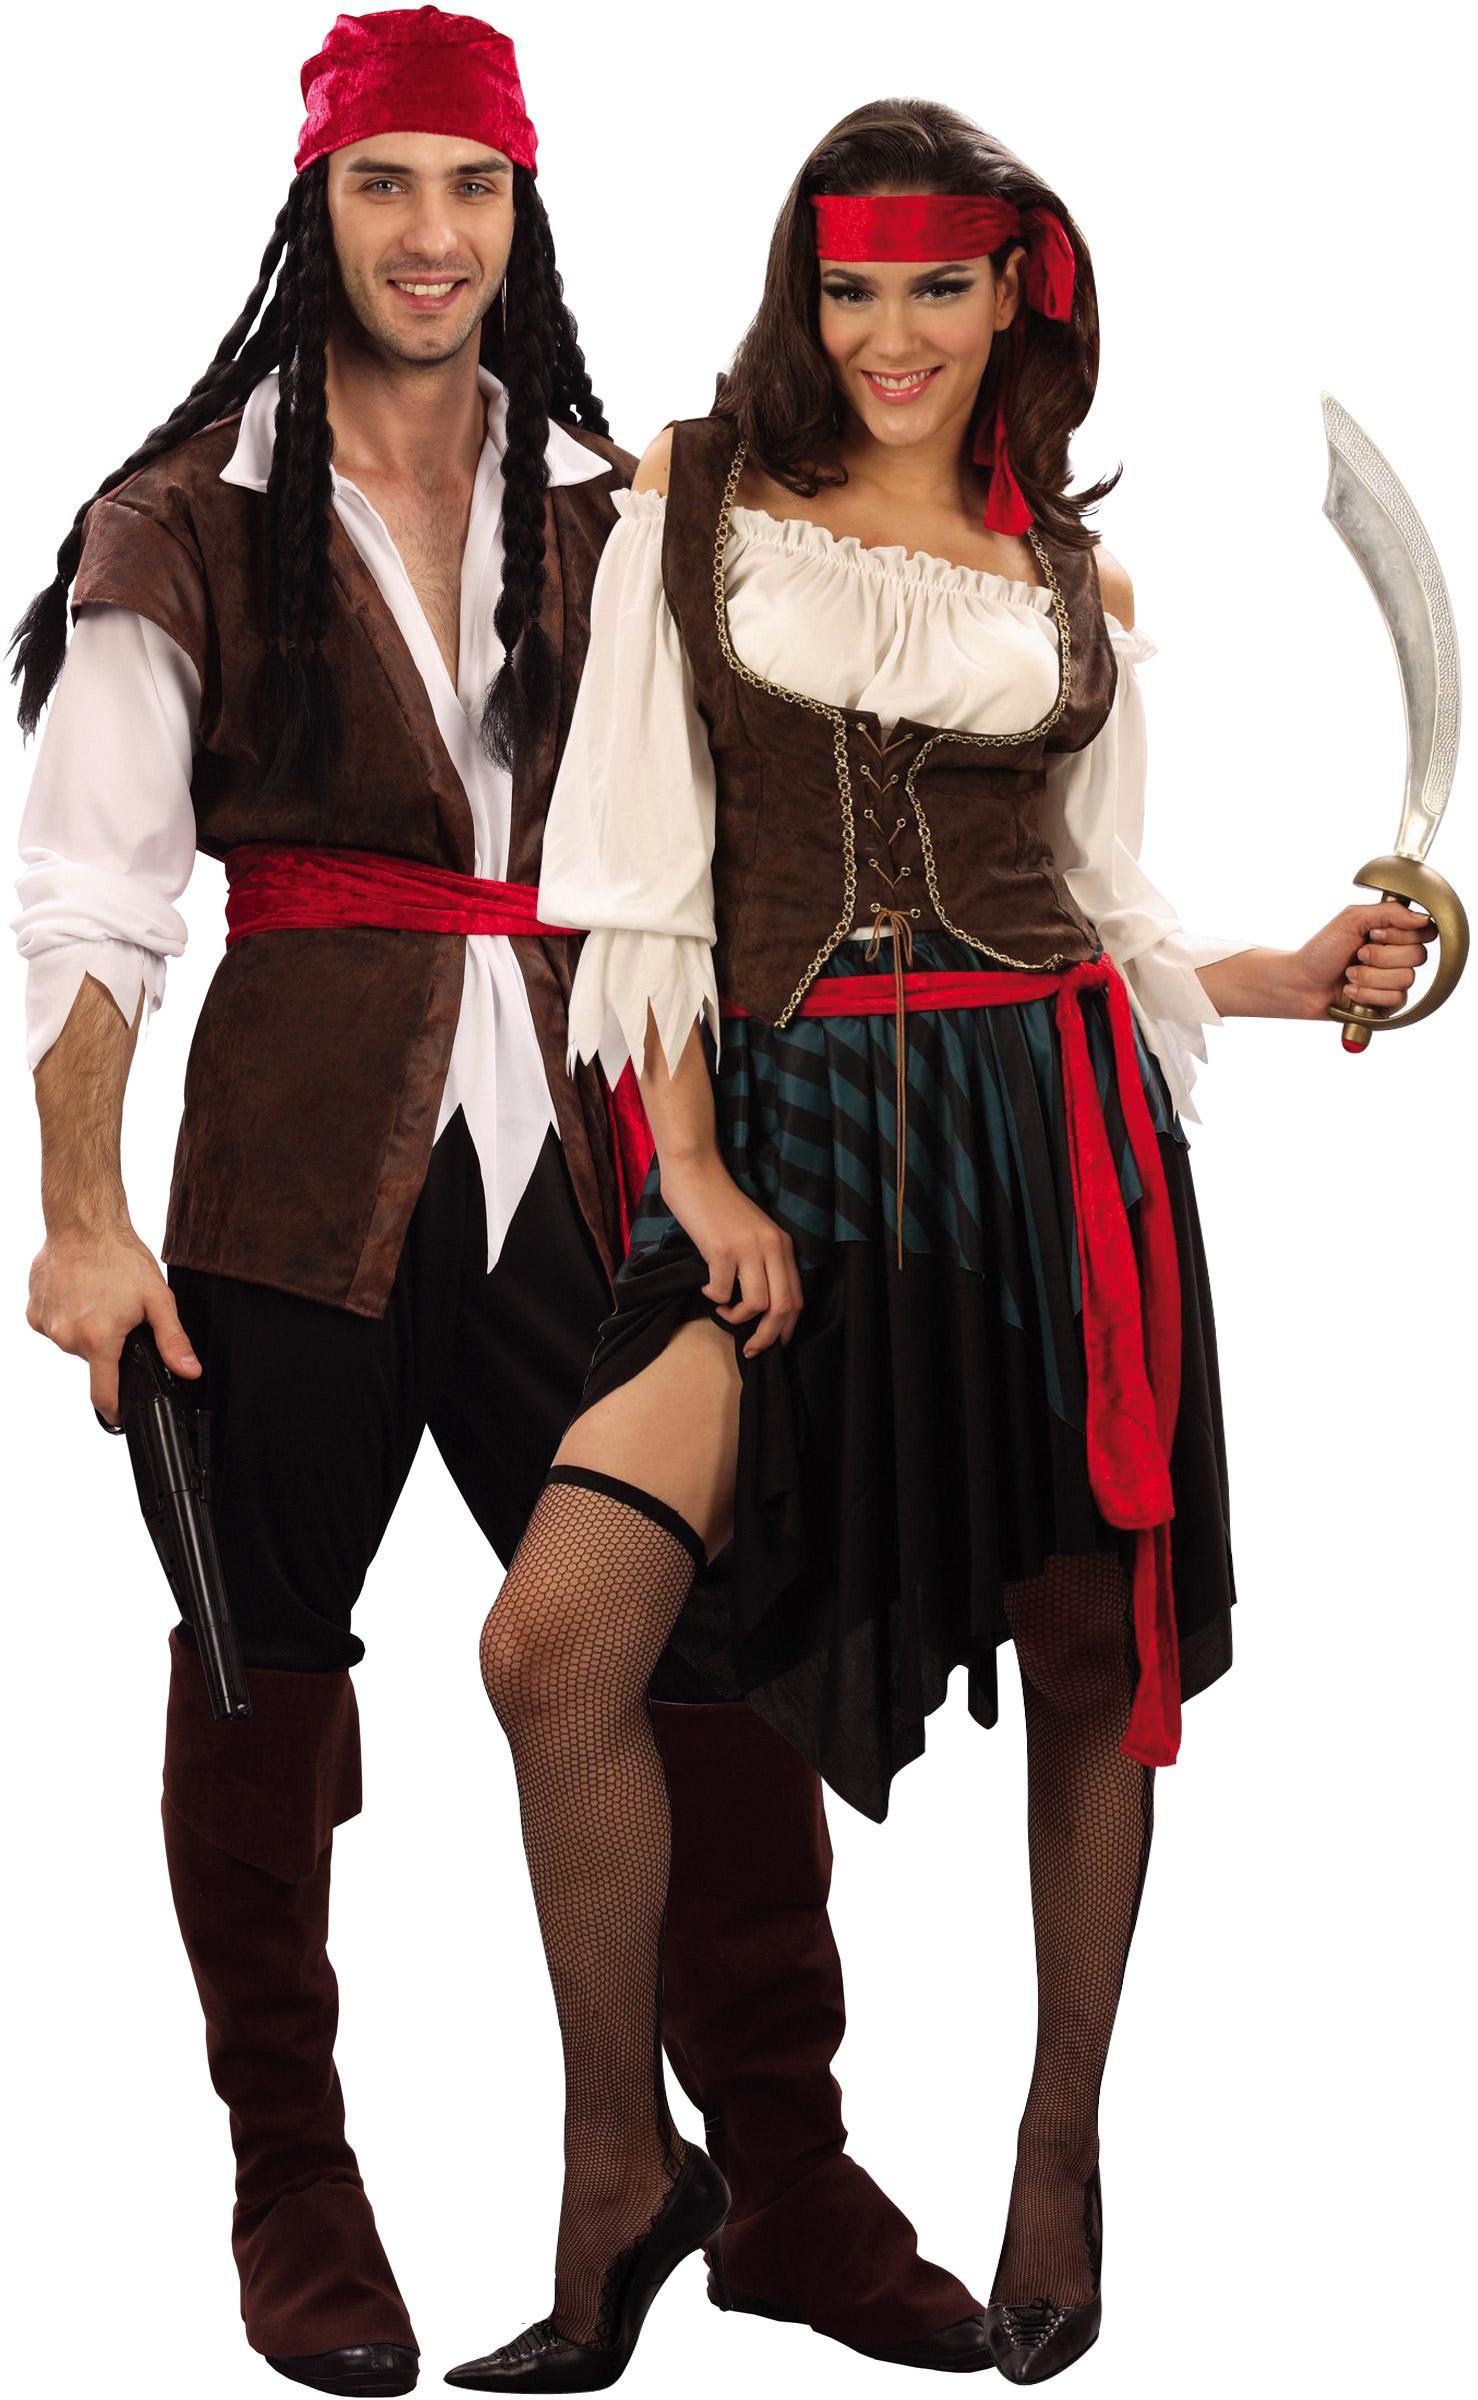 Foto disfraz de pareja de pirata de lujo foto 9115 - Trajes de carnaval de epoca ...